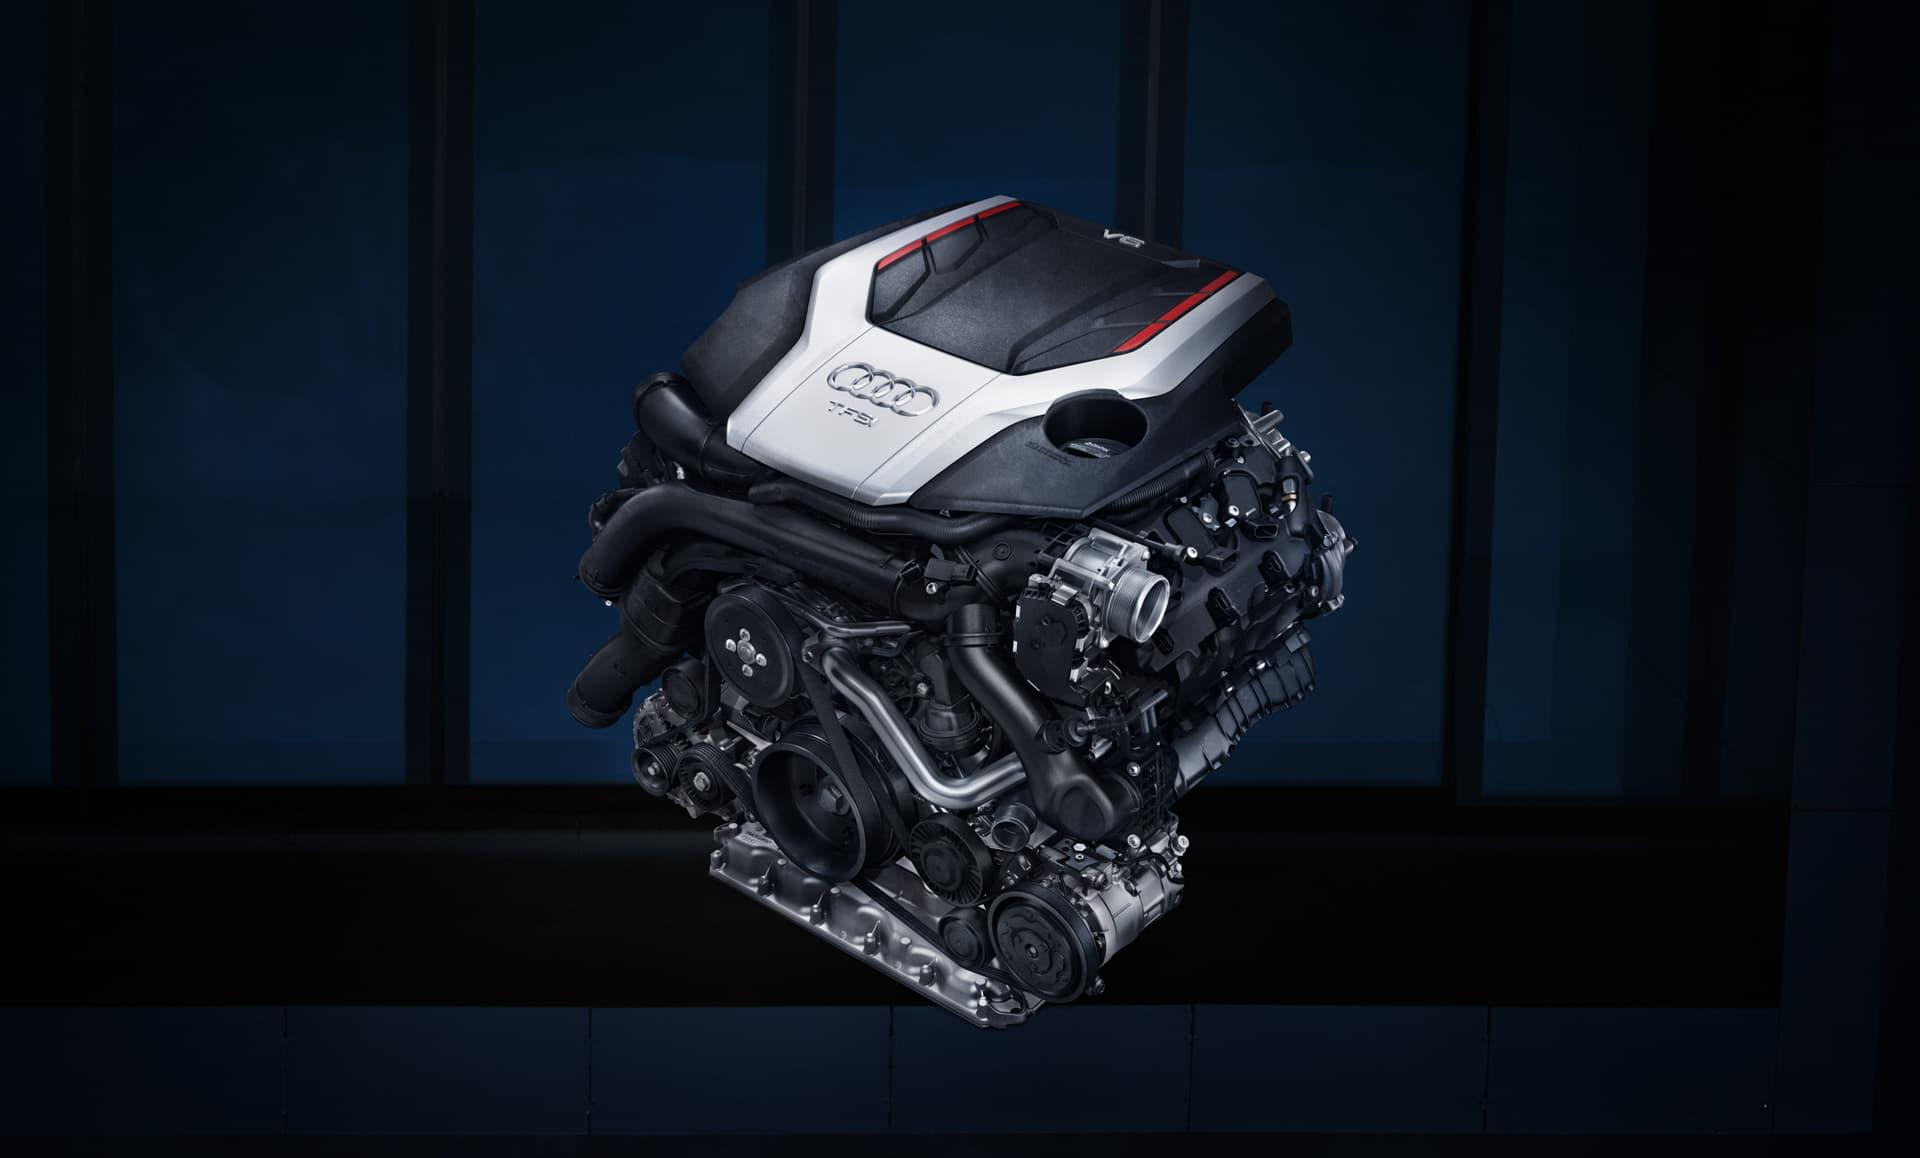 1920x1080_Audi_Motor_V6_05.jpg